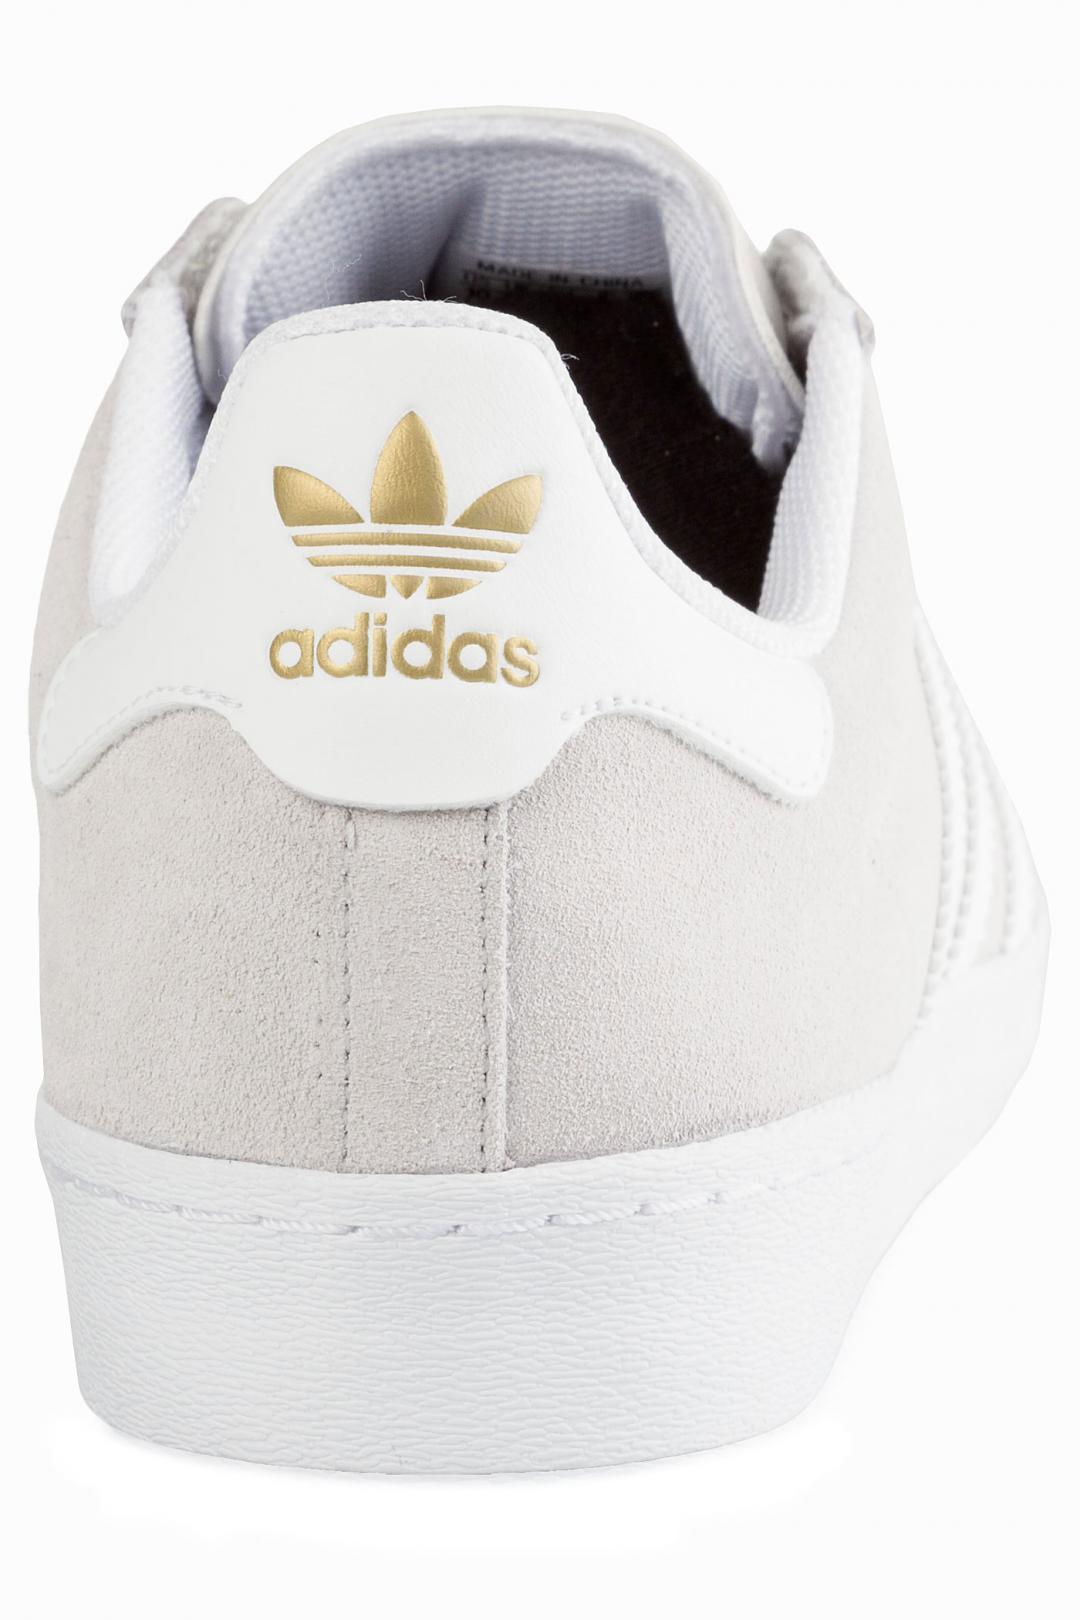 Uomo adidas Superstar Vulc ADV grey one white gold   Scarpe da skate